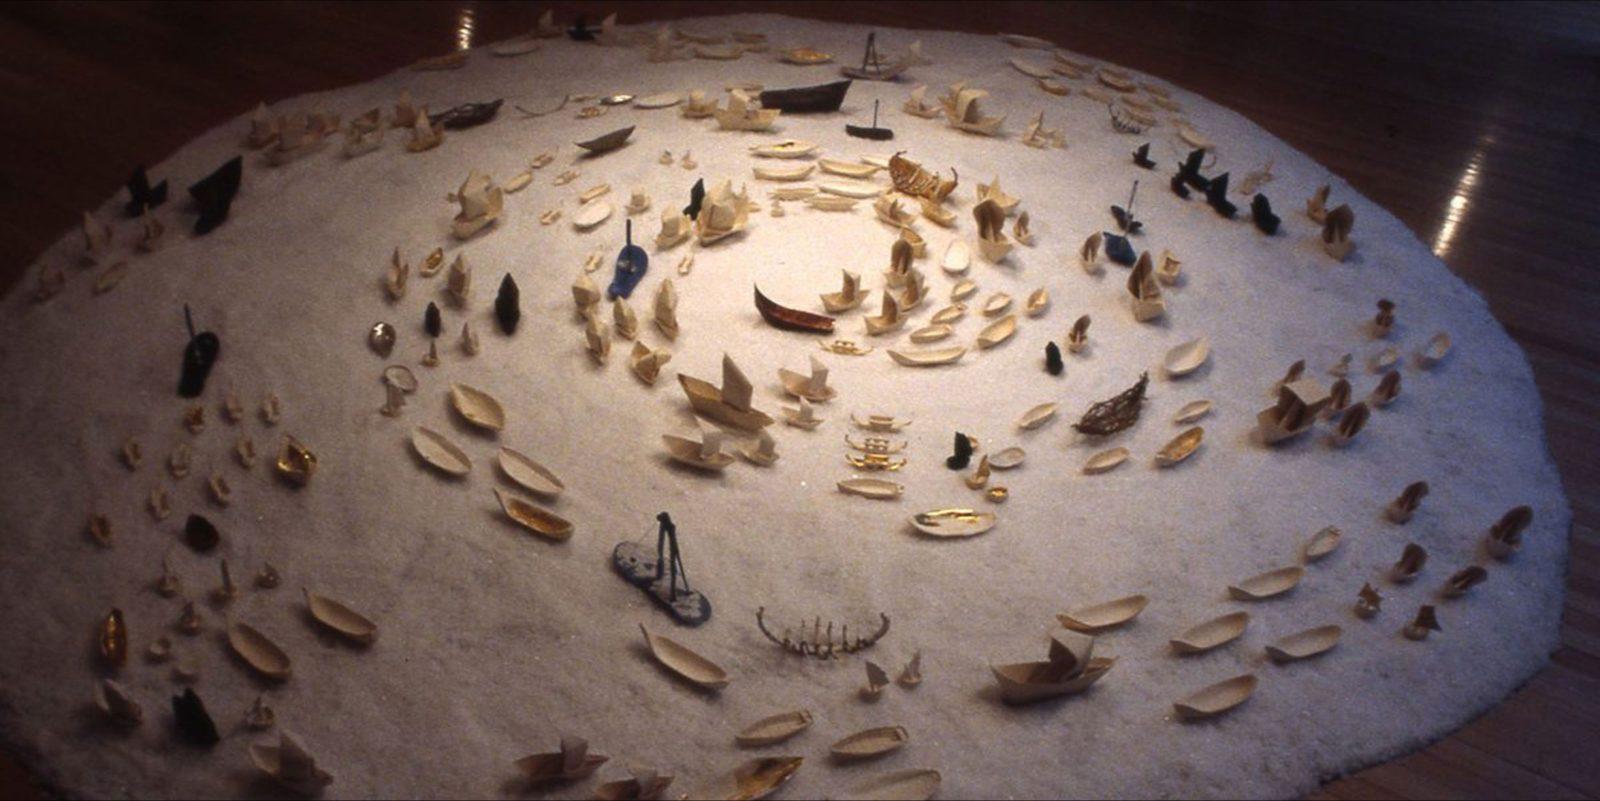 Island to Inland Exhibit, Flotilla, mixed media, dimensions variable